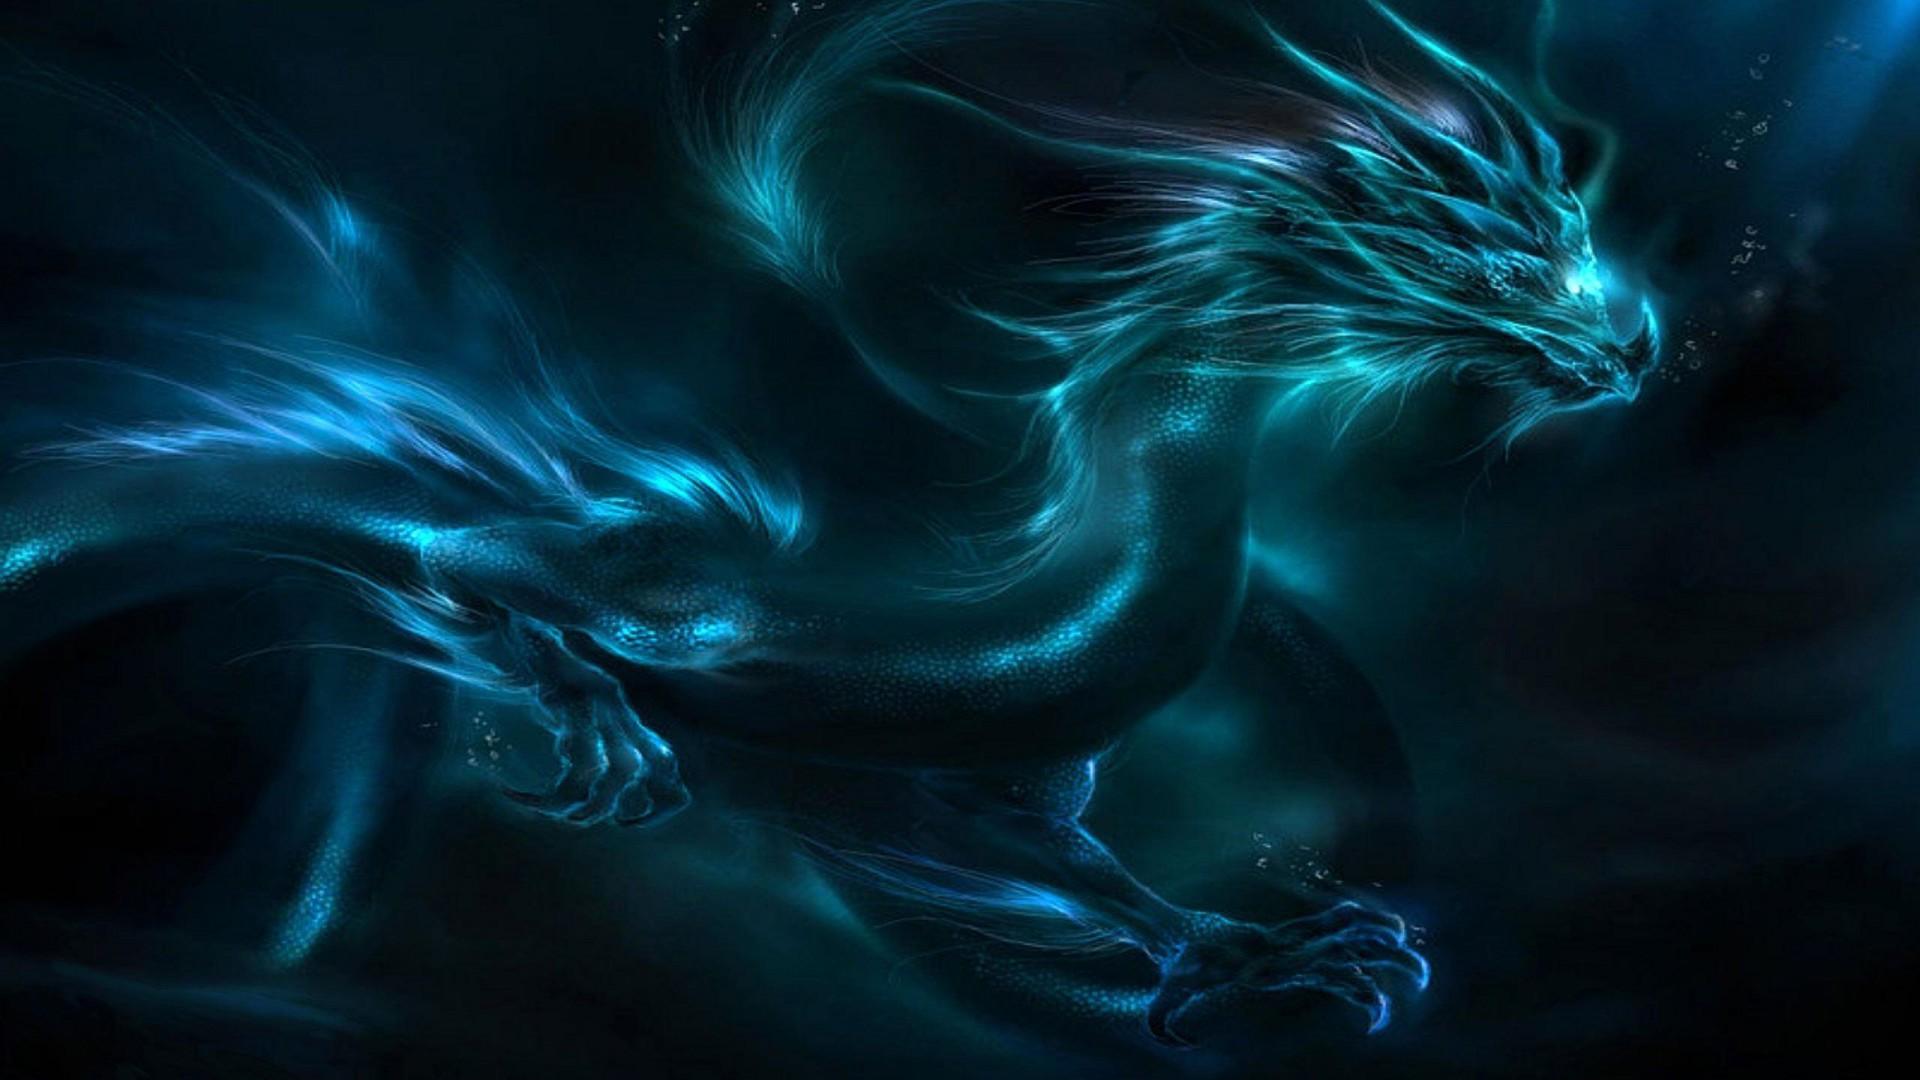 Blue Lightning Dragon Wallpaper HD Wallpaper Area HD Wallpapers 1920x1080